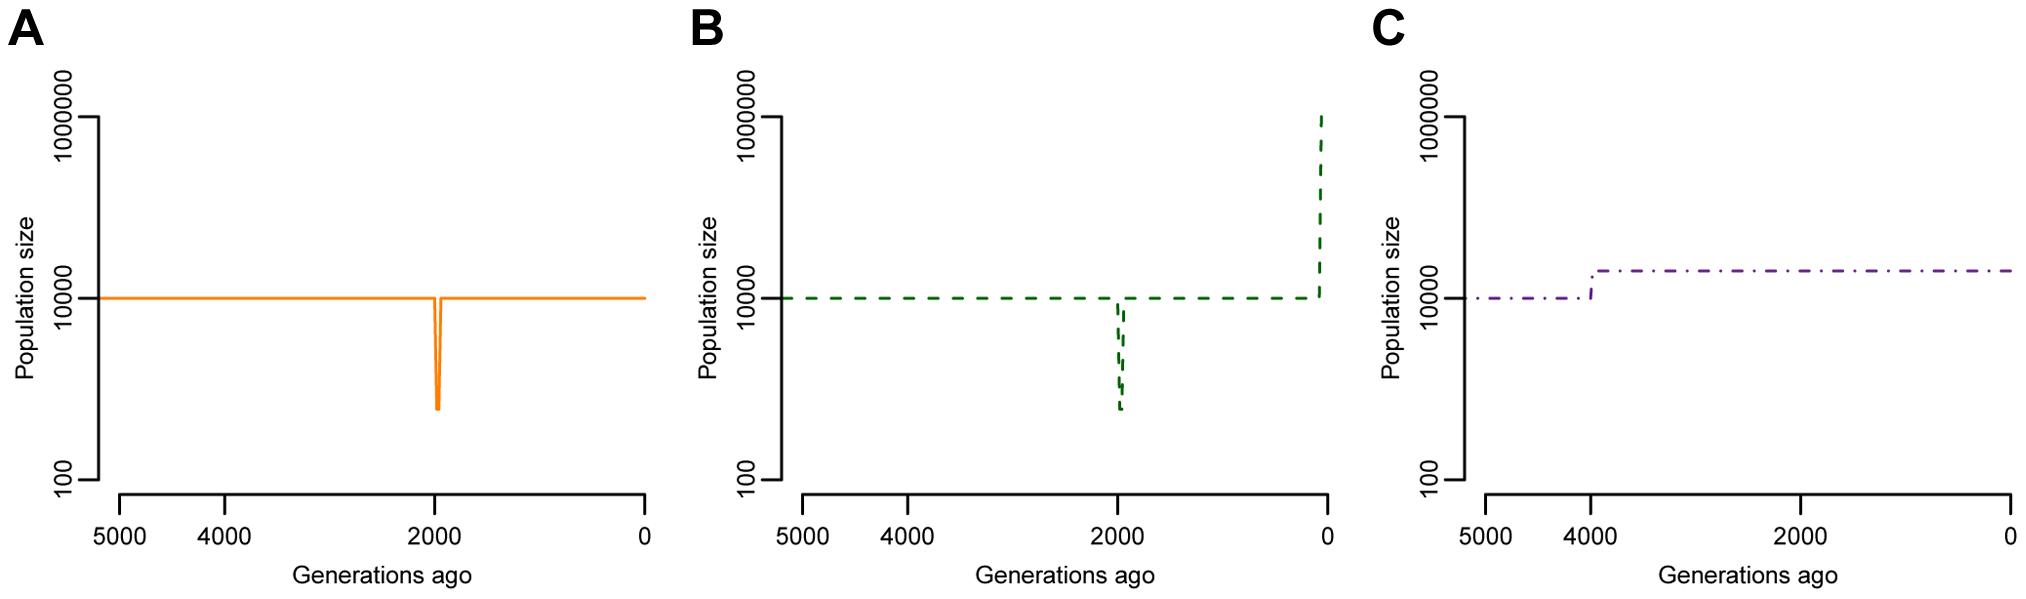 Models of population size changes over time.